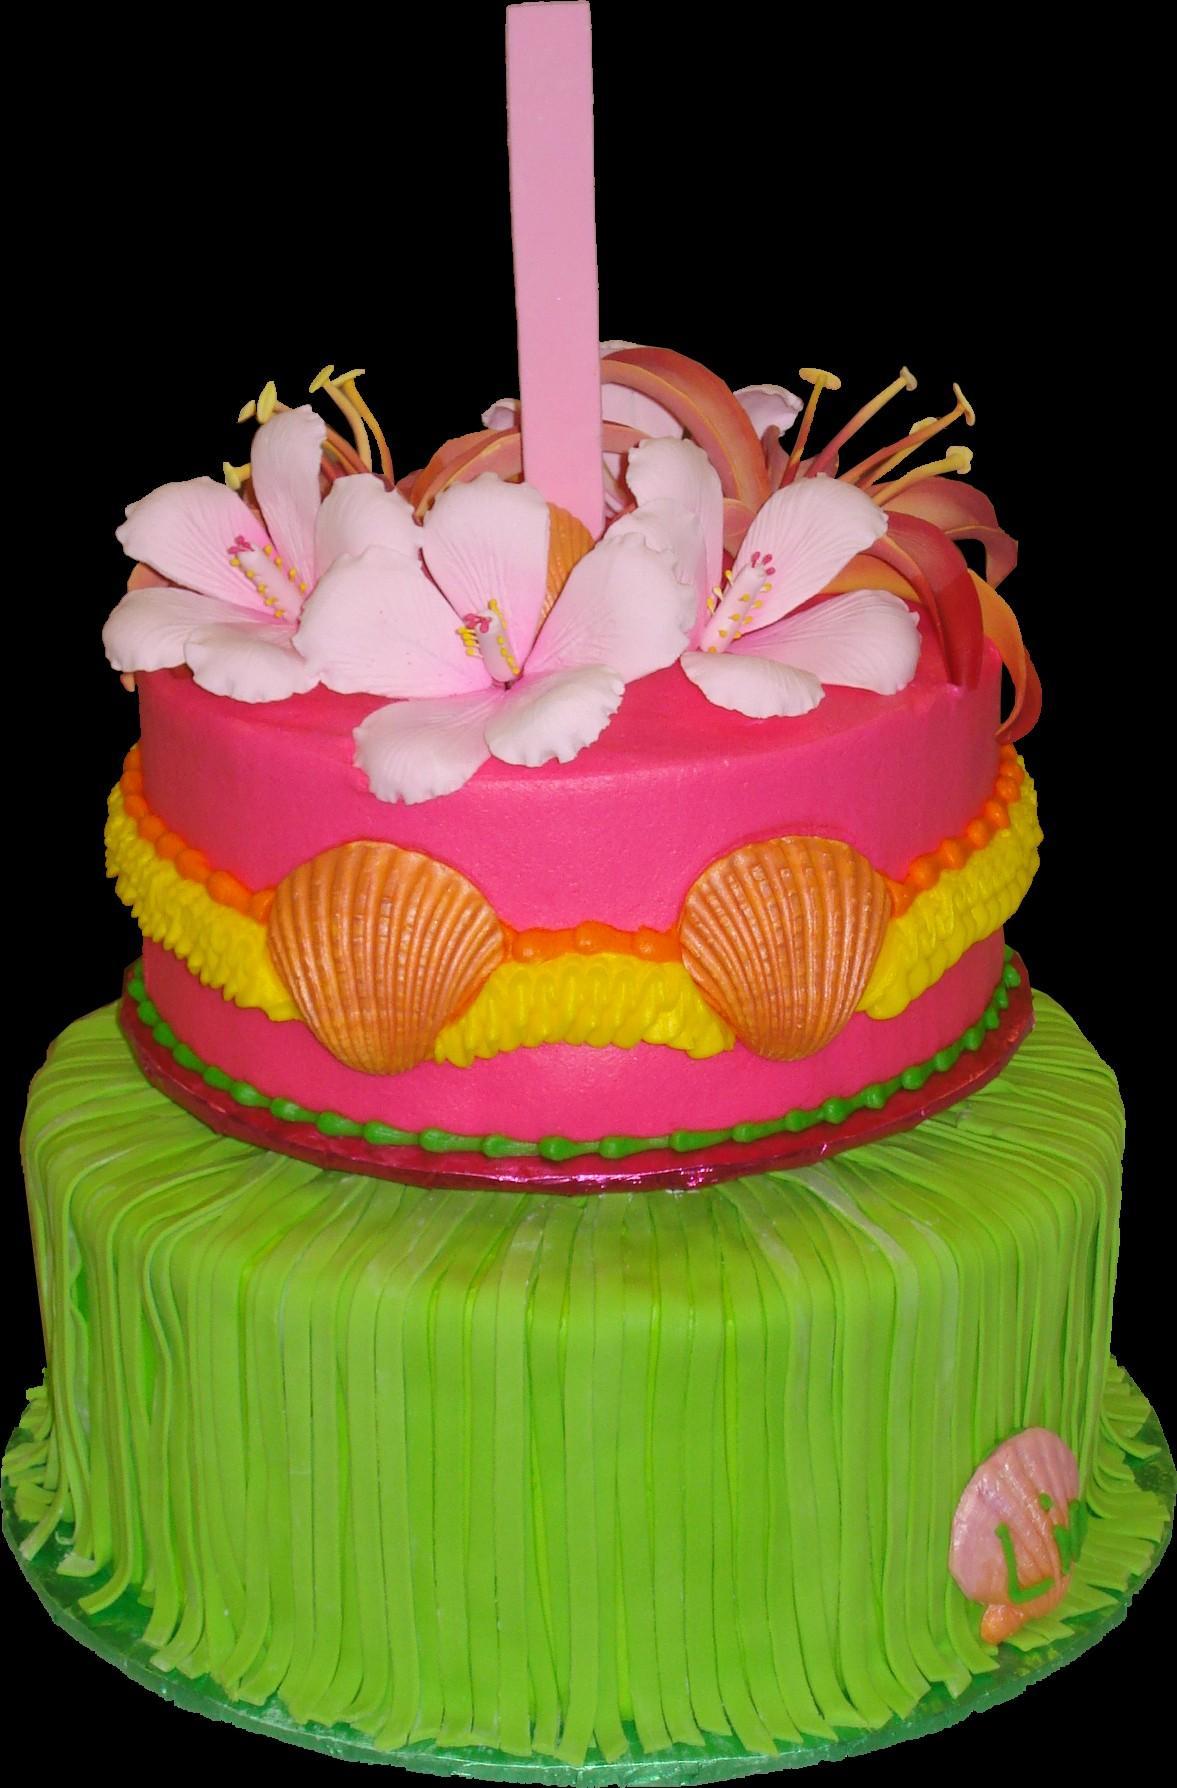 Tropics clipart birthday cake #12